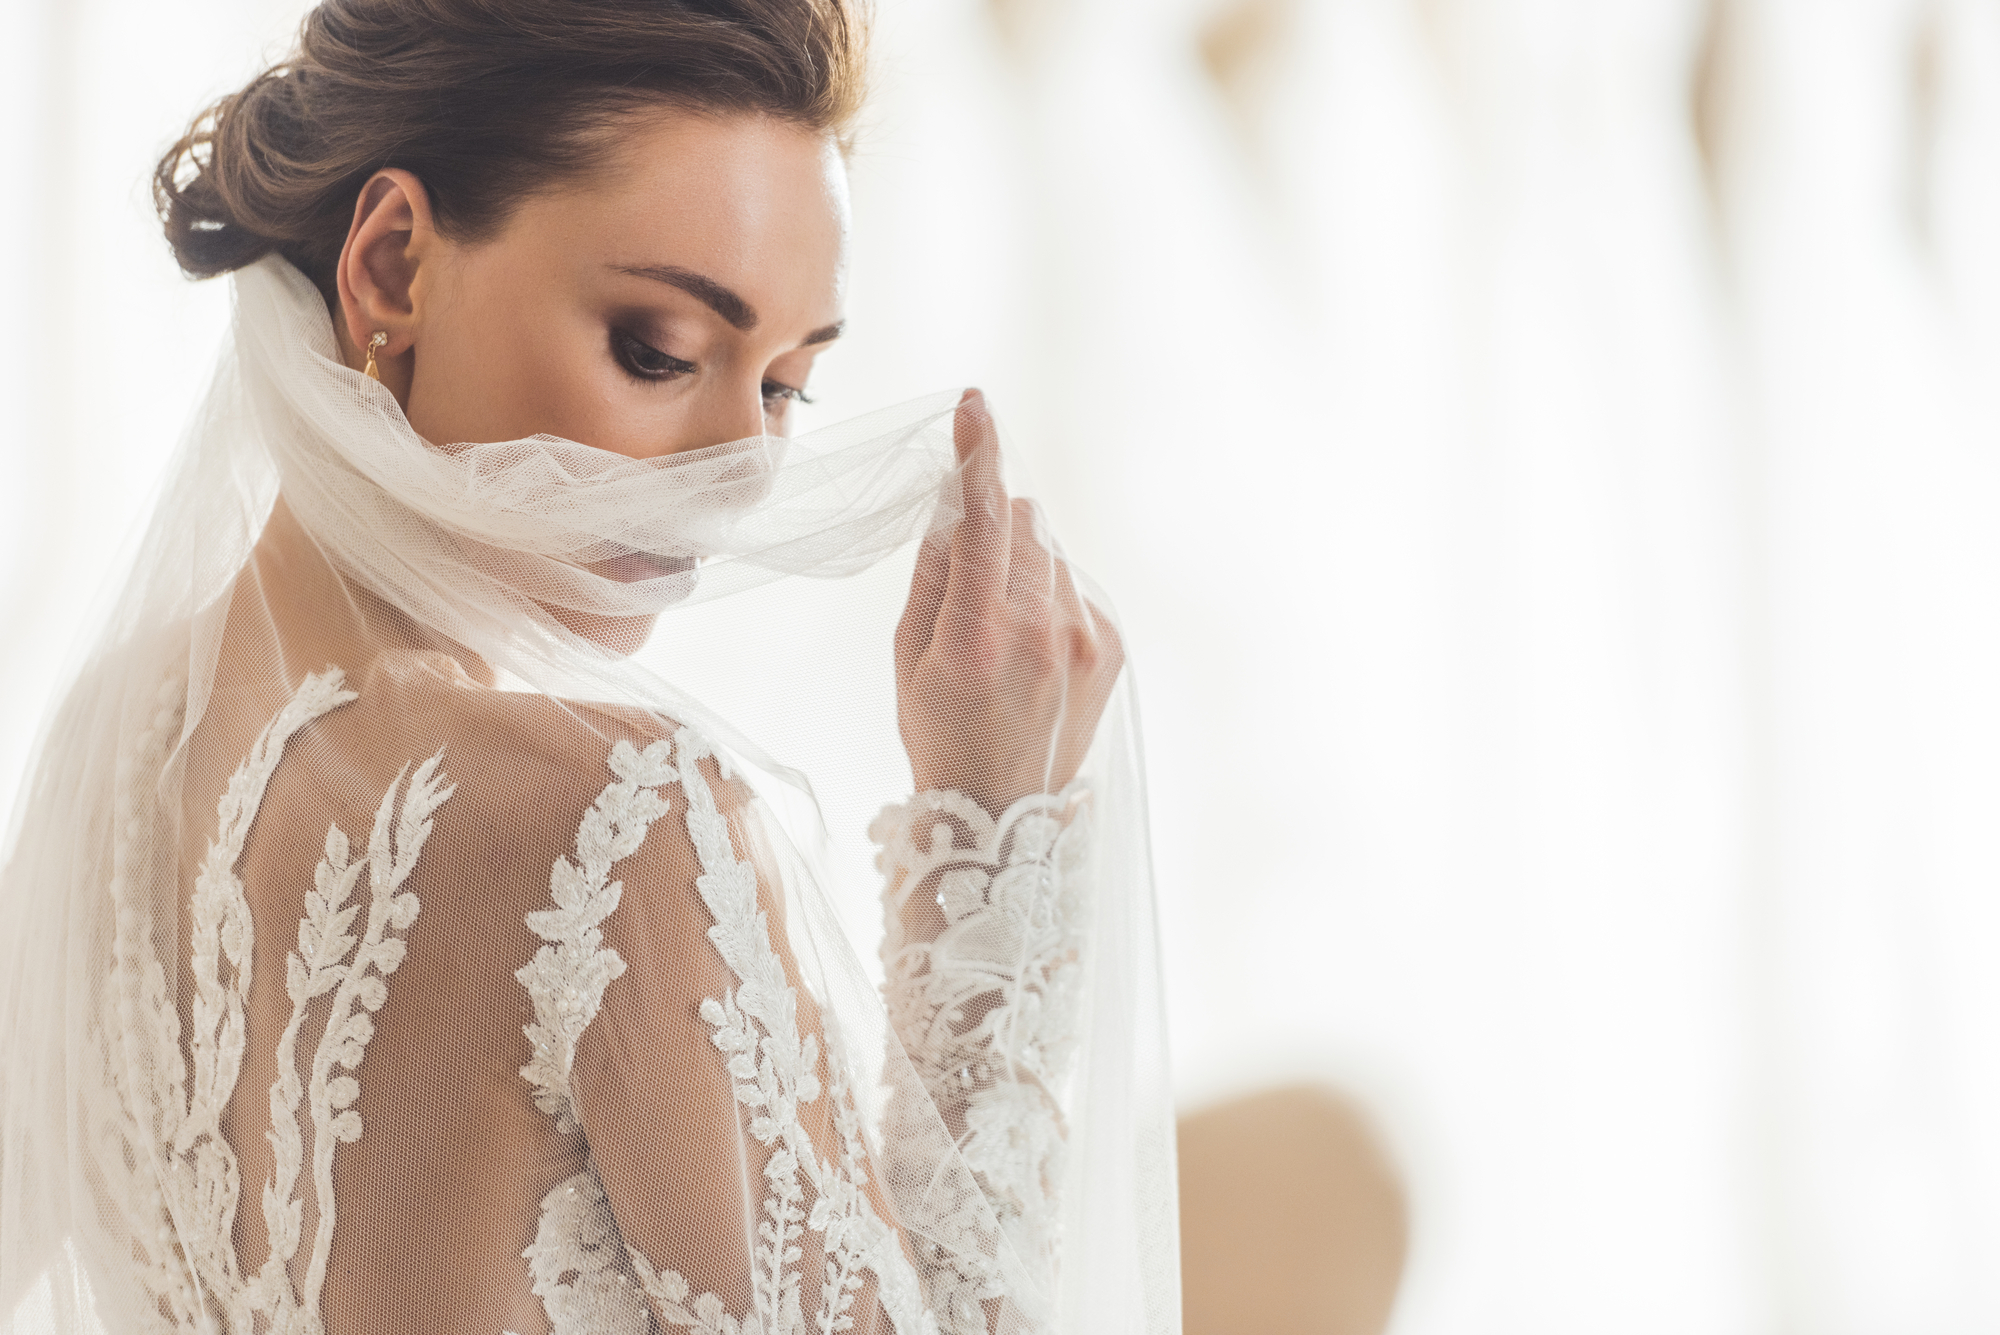 8 Popular Wedding Dress Fabrics Every Bride Should Know